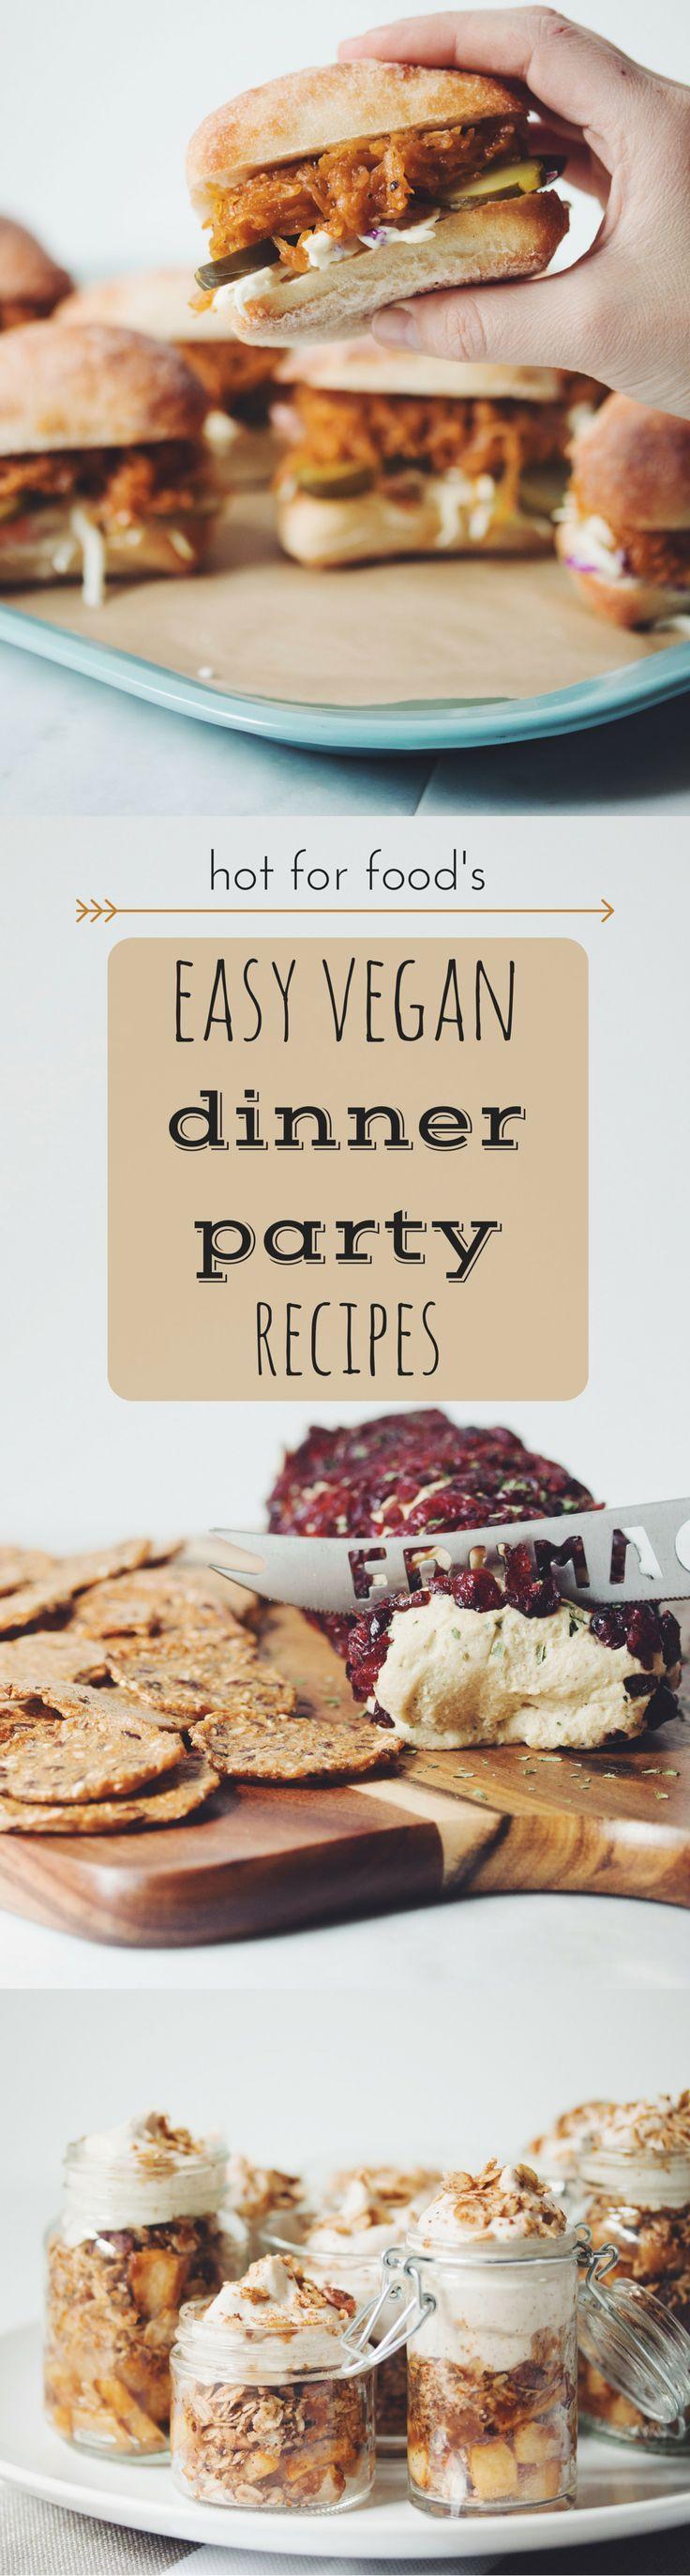 easy vegan dinner party recipes | RECIPES on hotforfoodblog.com